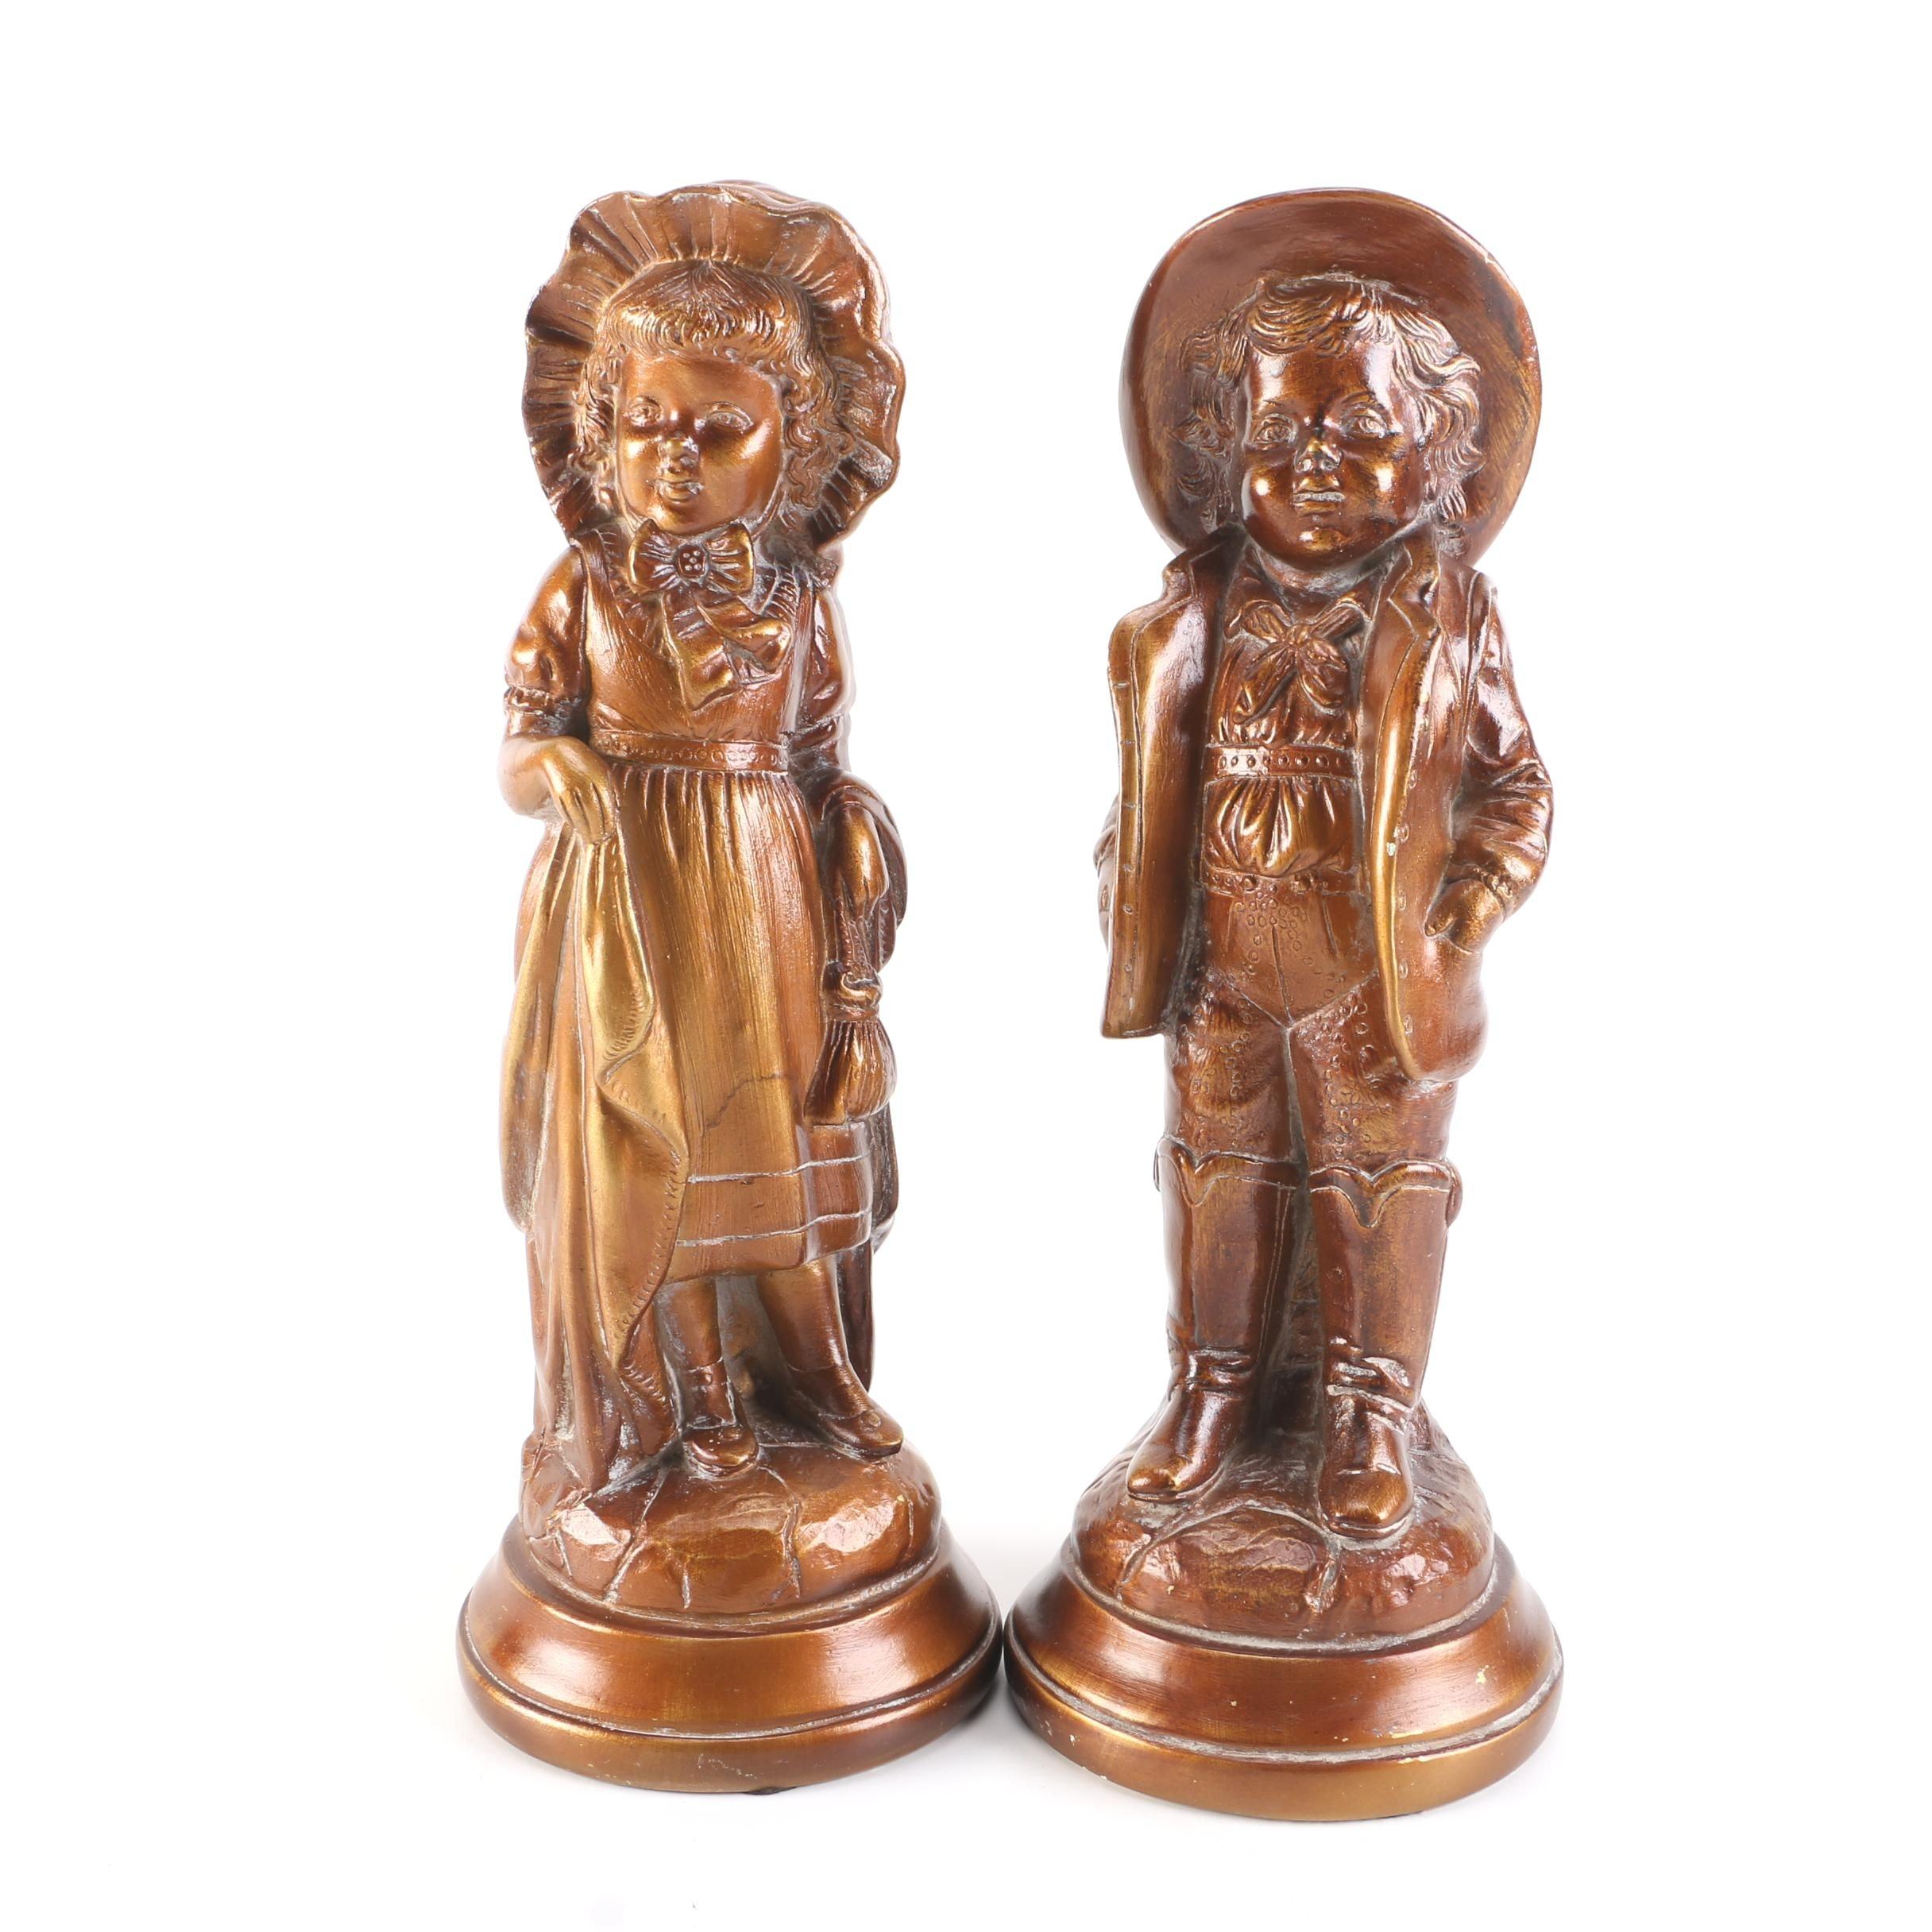 Pair of Jaru Boy and Girl Statues